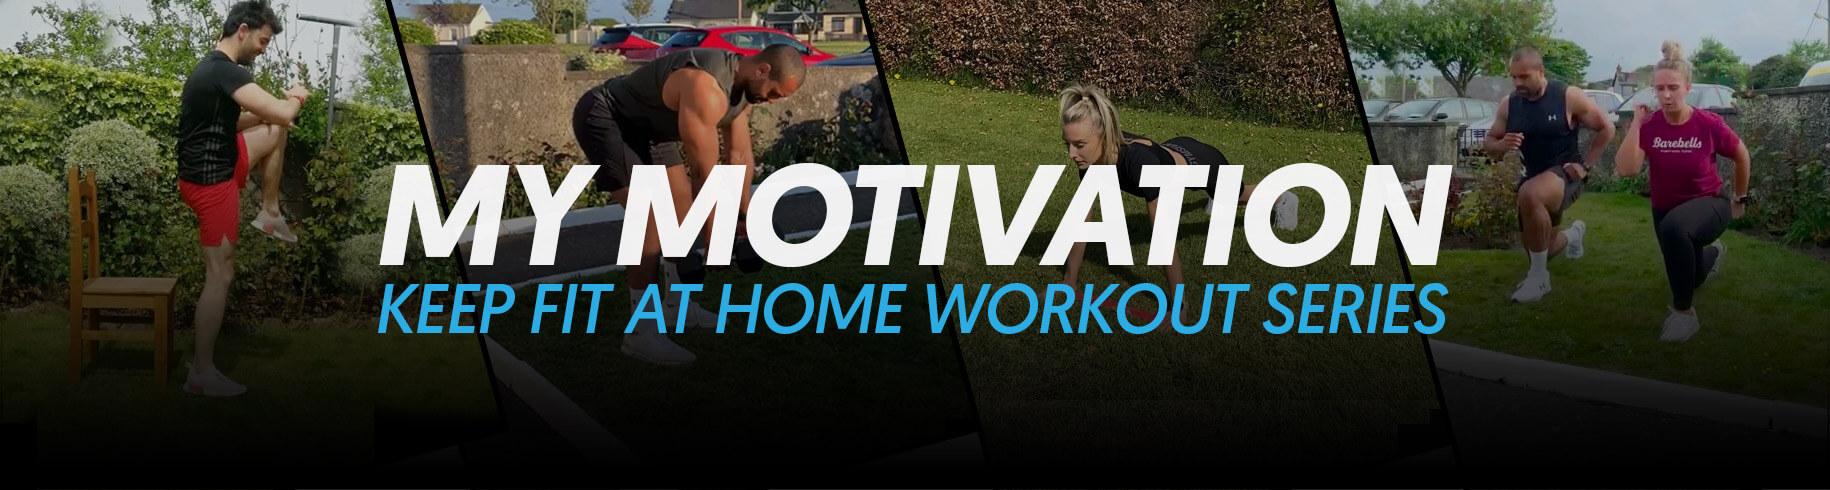 My Motivation Workout Series Header